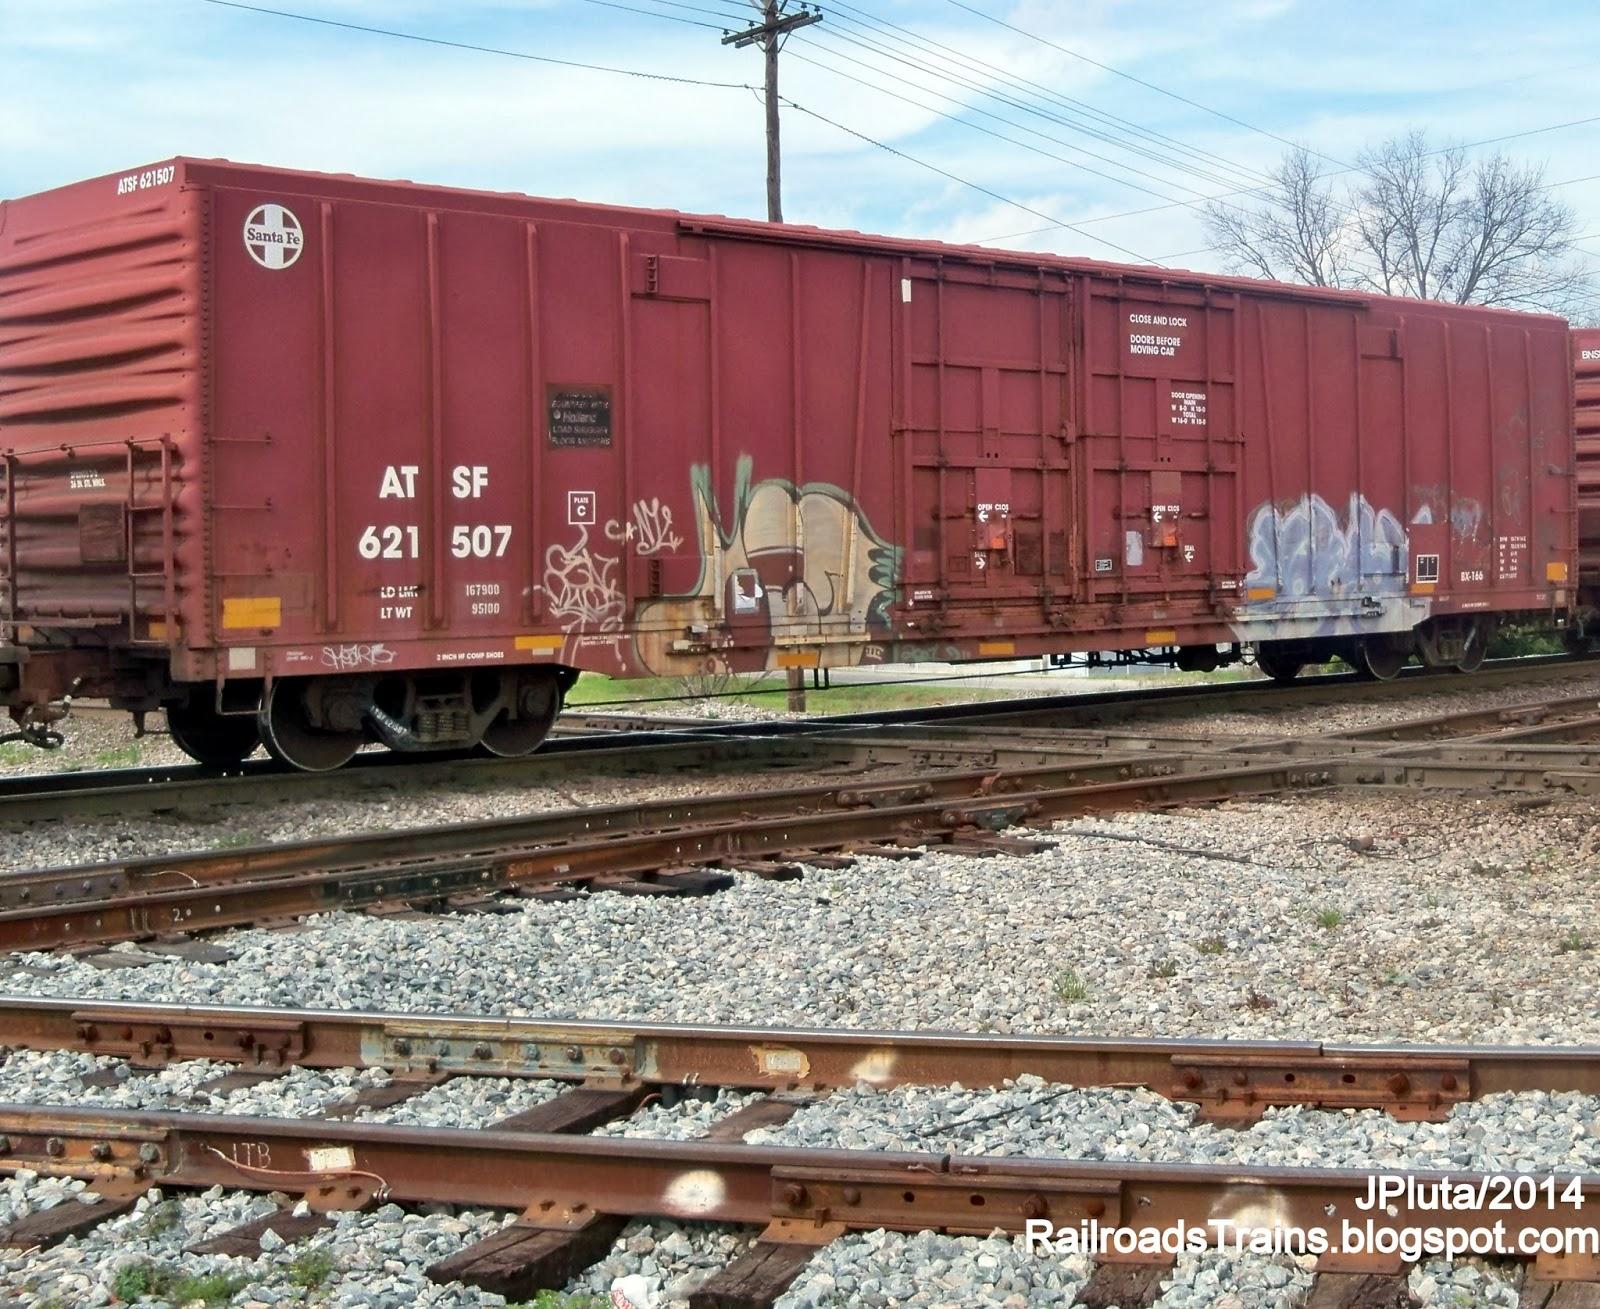 RAILROAD Freight Train Locomotive Engine EMD GE Boxcar BNSFCSX - Atchinson topeka and santa ferailroad on the us map